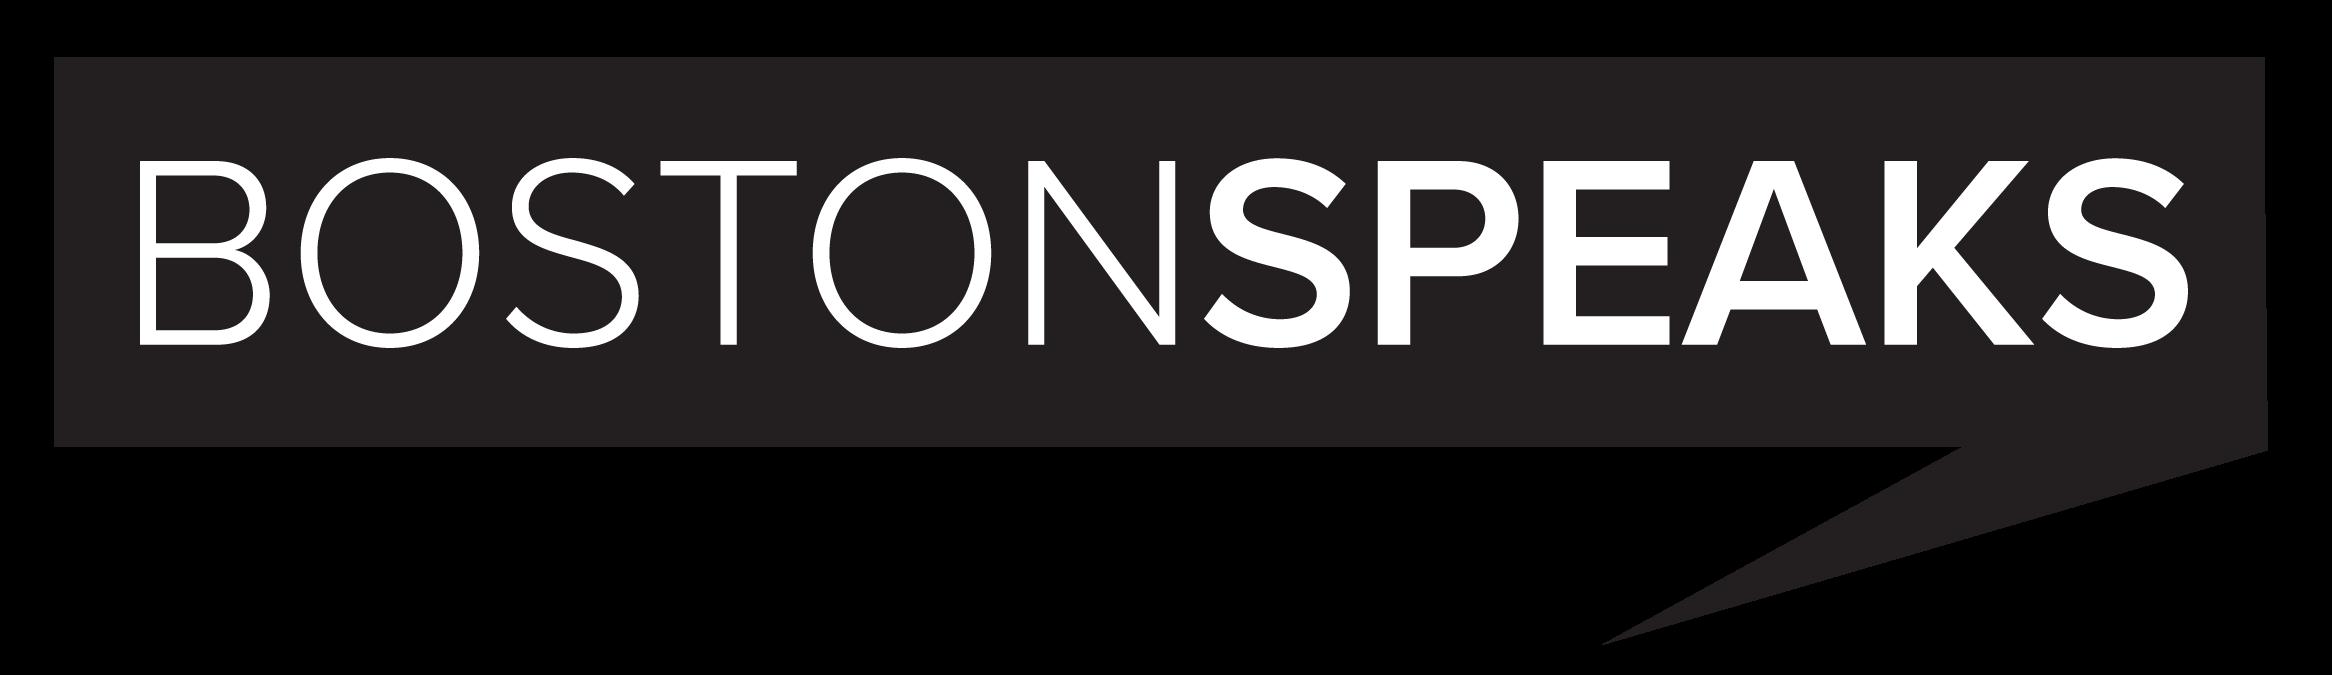 BostonSpeaks-logo